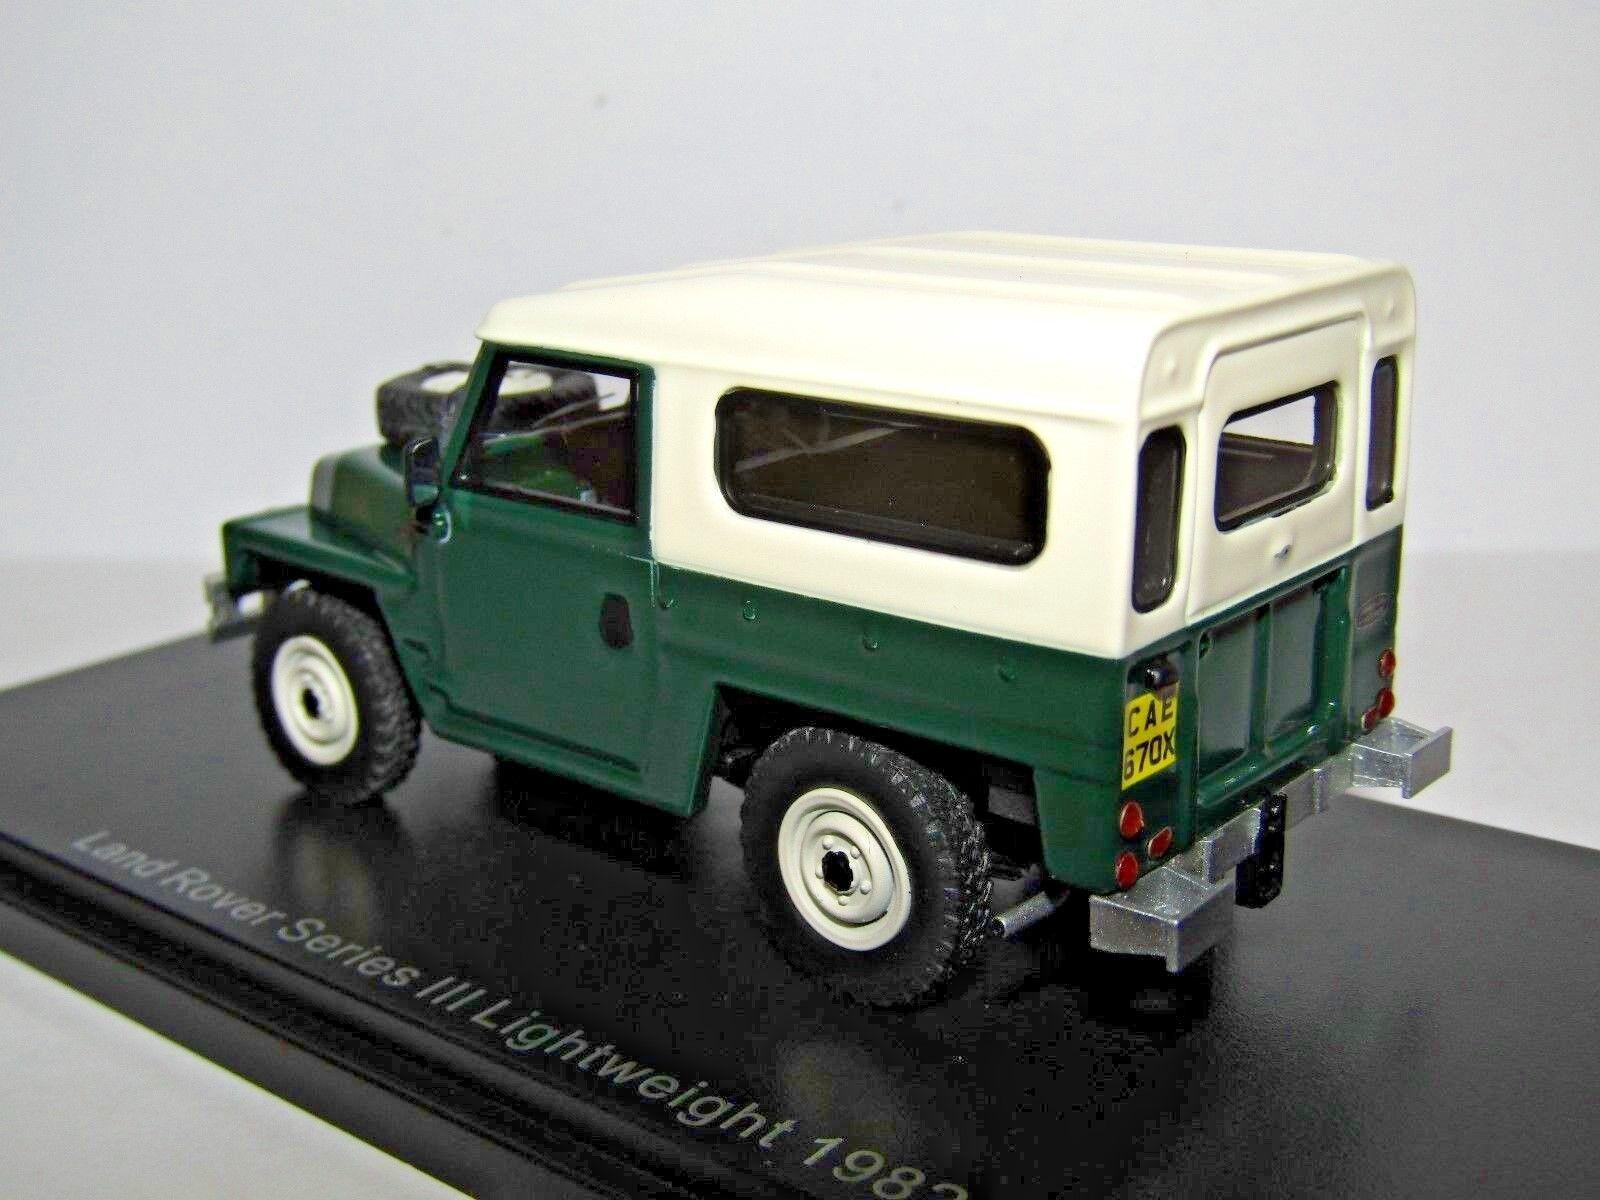 BOS BOS BOS Land Rover Série III Léger 1982 1 43 résine BOS43670 Beste of show fcc00f